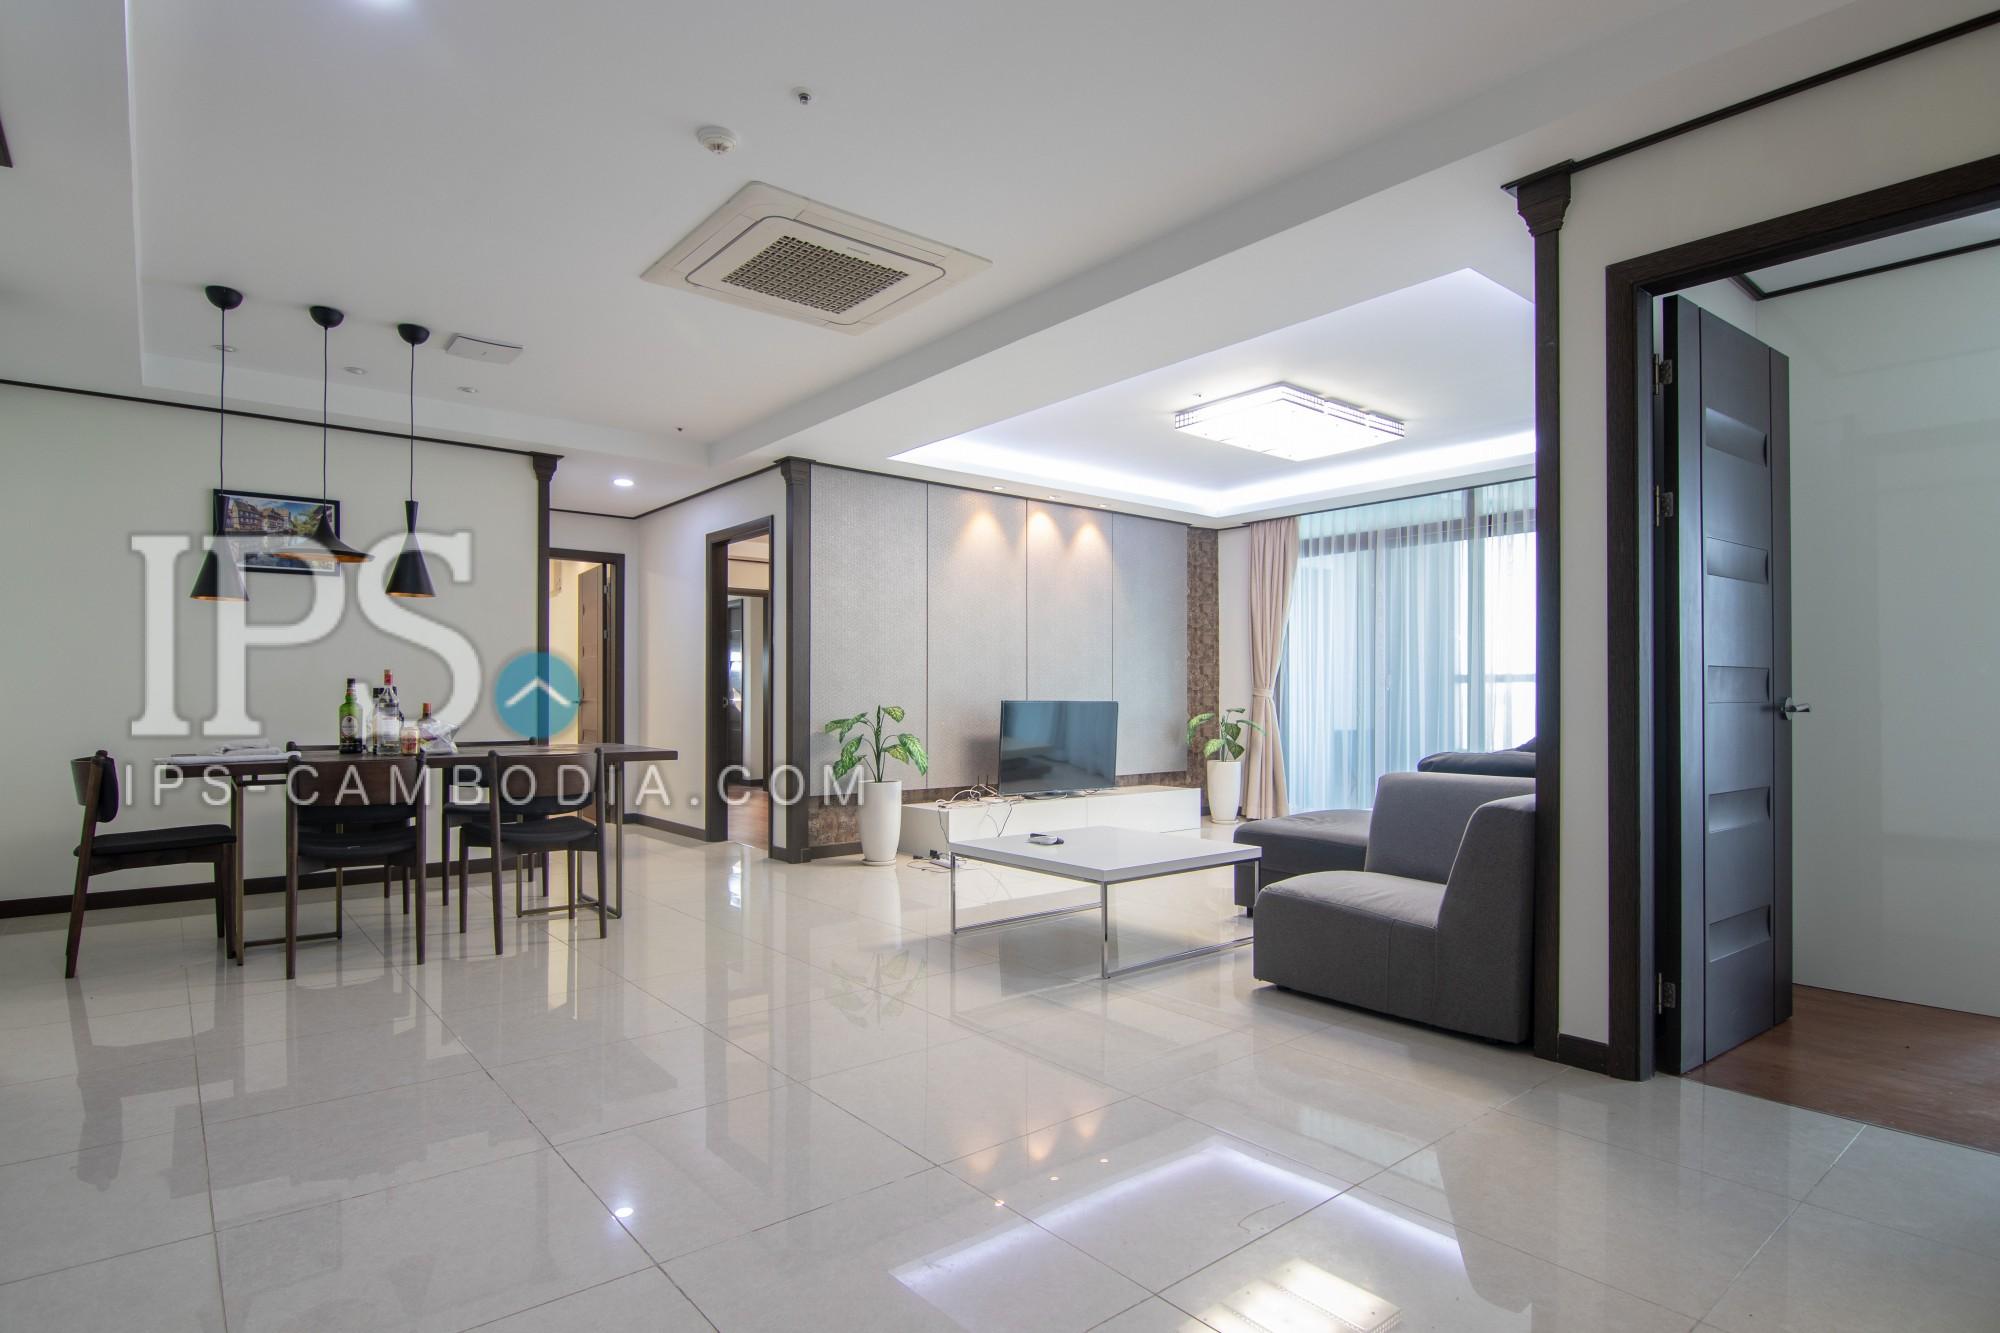 3 Bedroom Apartment For Sale - BKK1, Phnom Penh